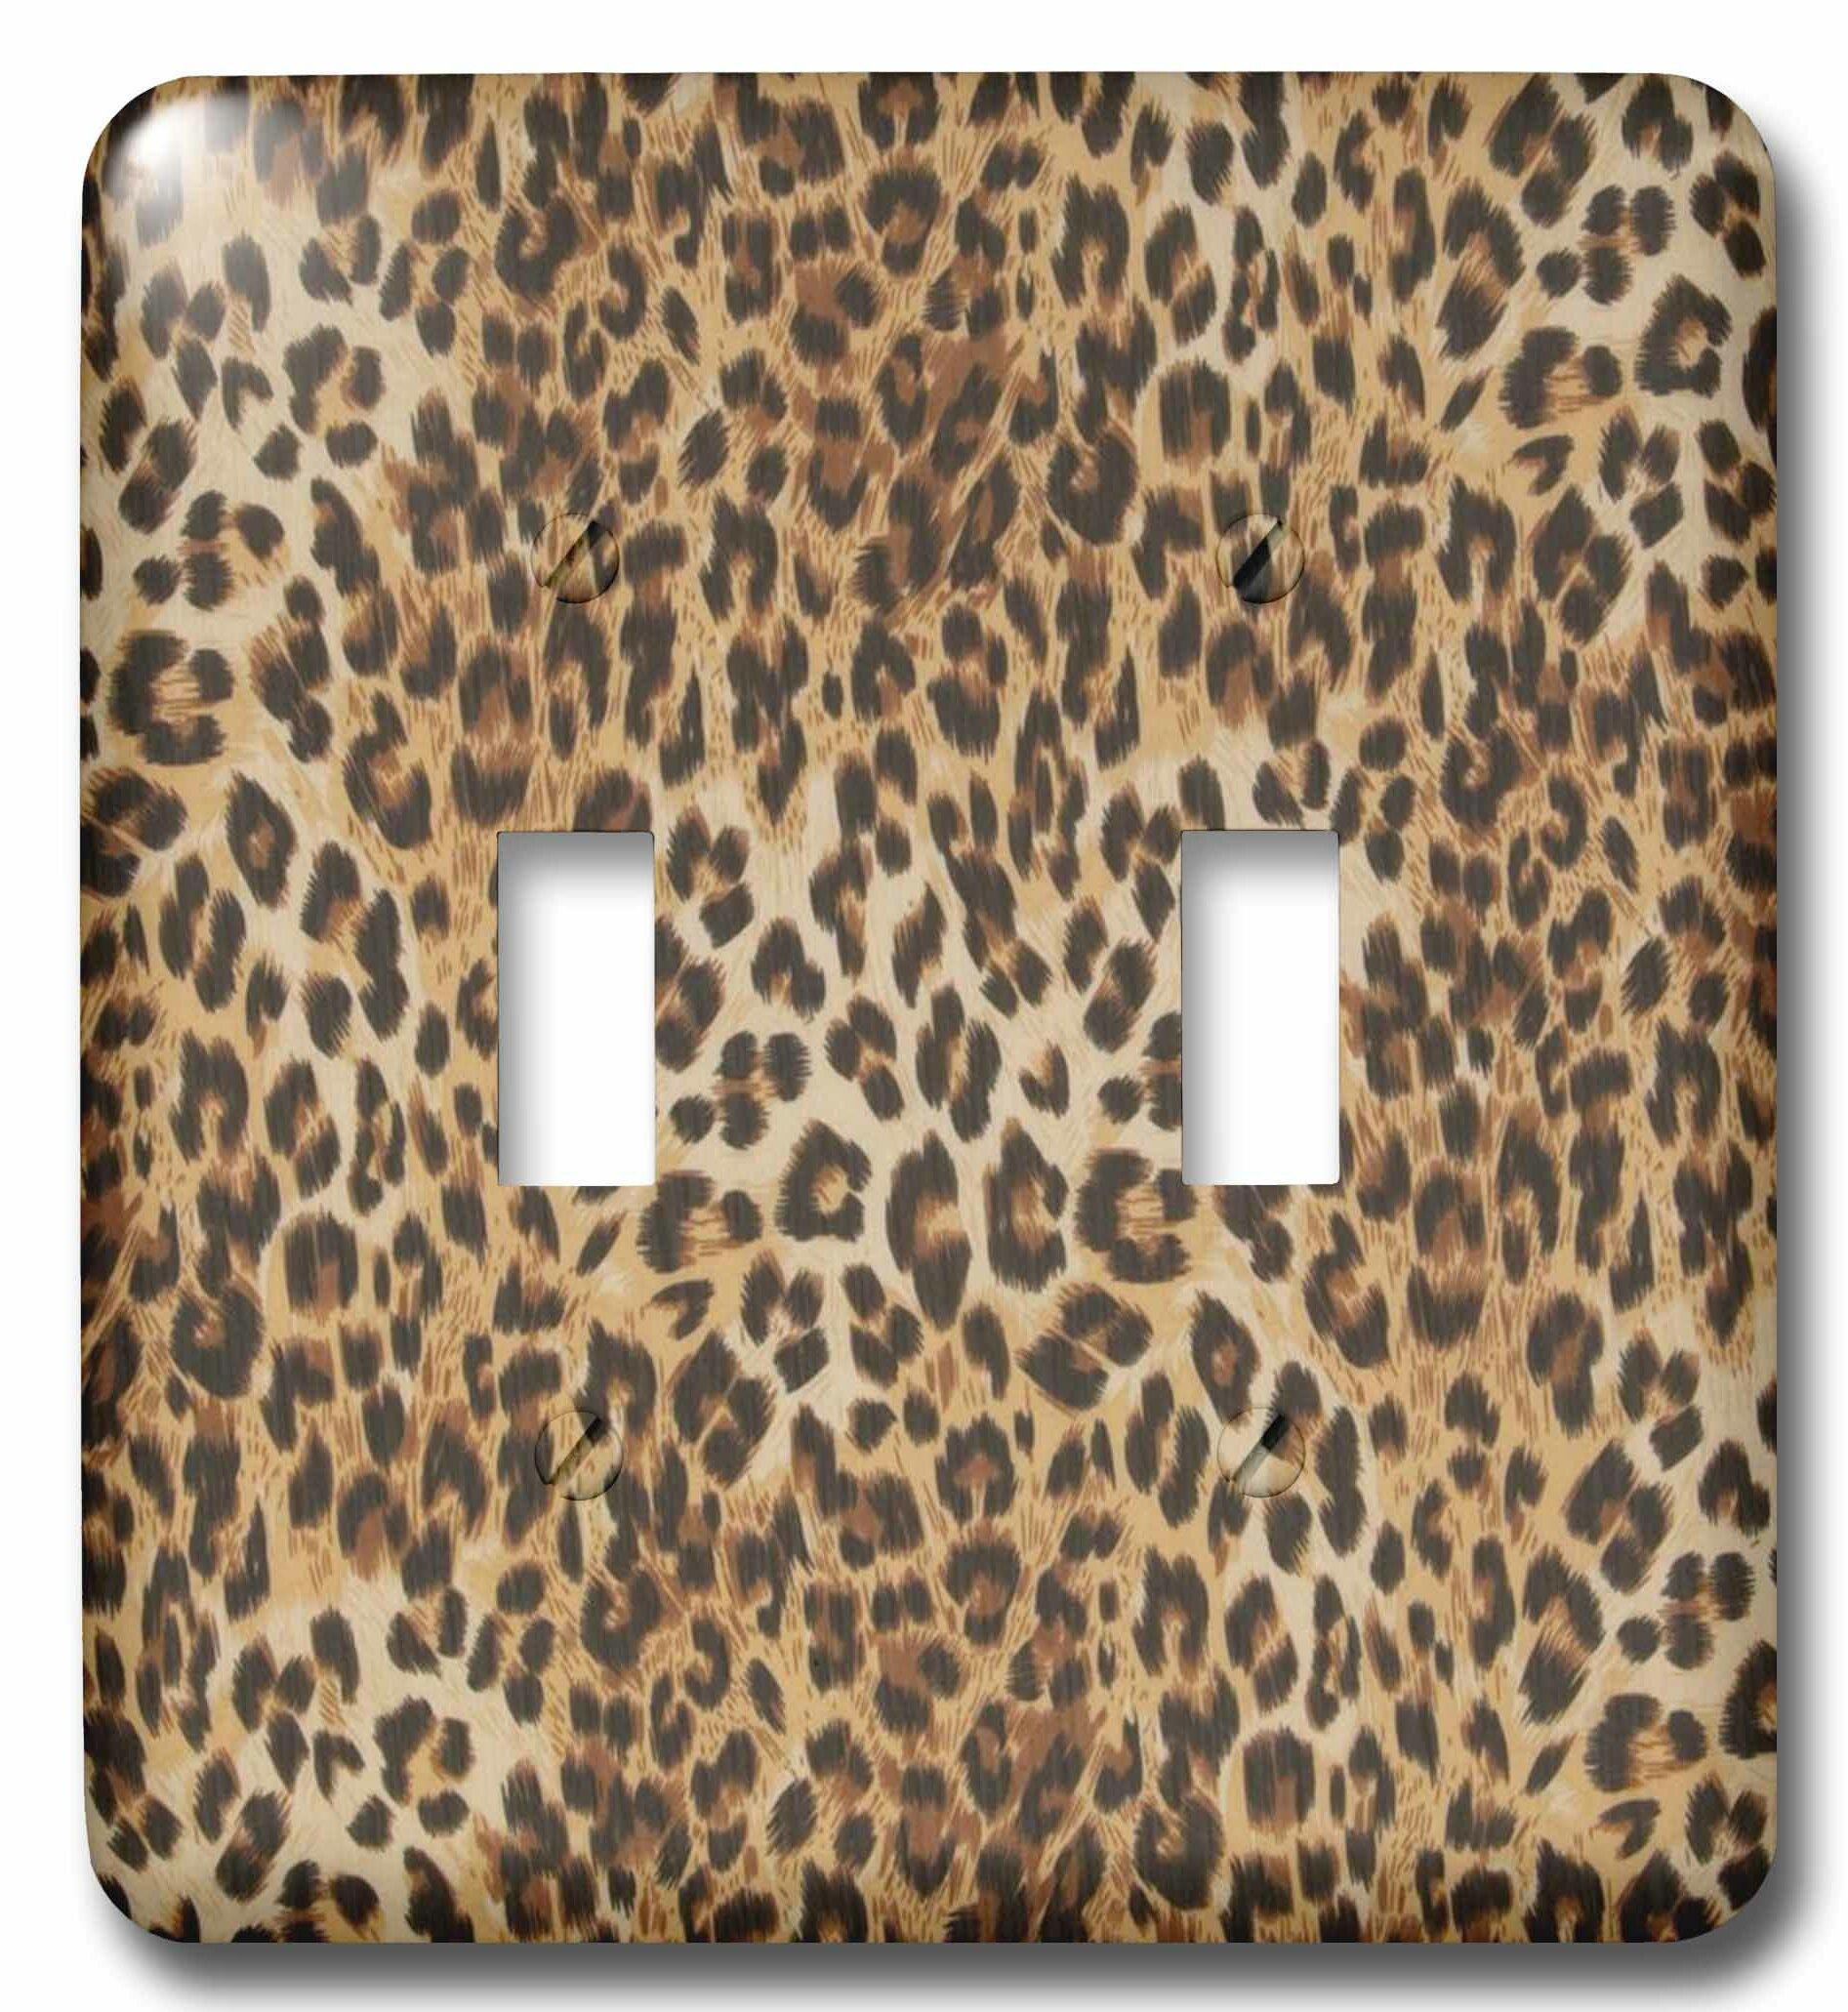 3drose Cheetah Print 2 Gang Toggle Light Switch Wall Plate Wayfair